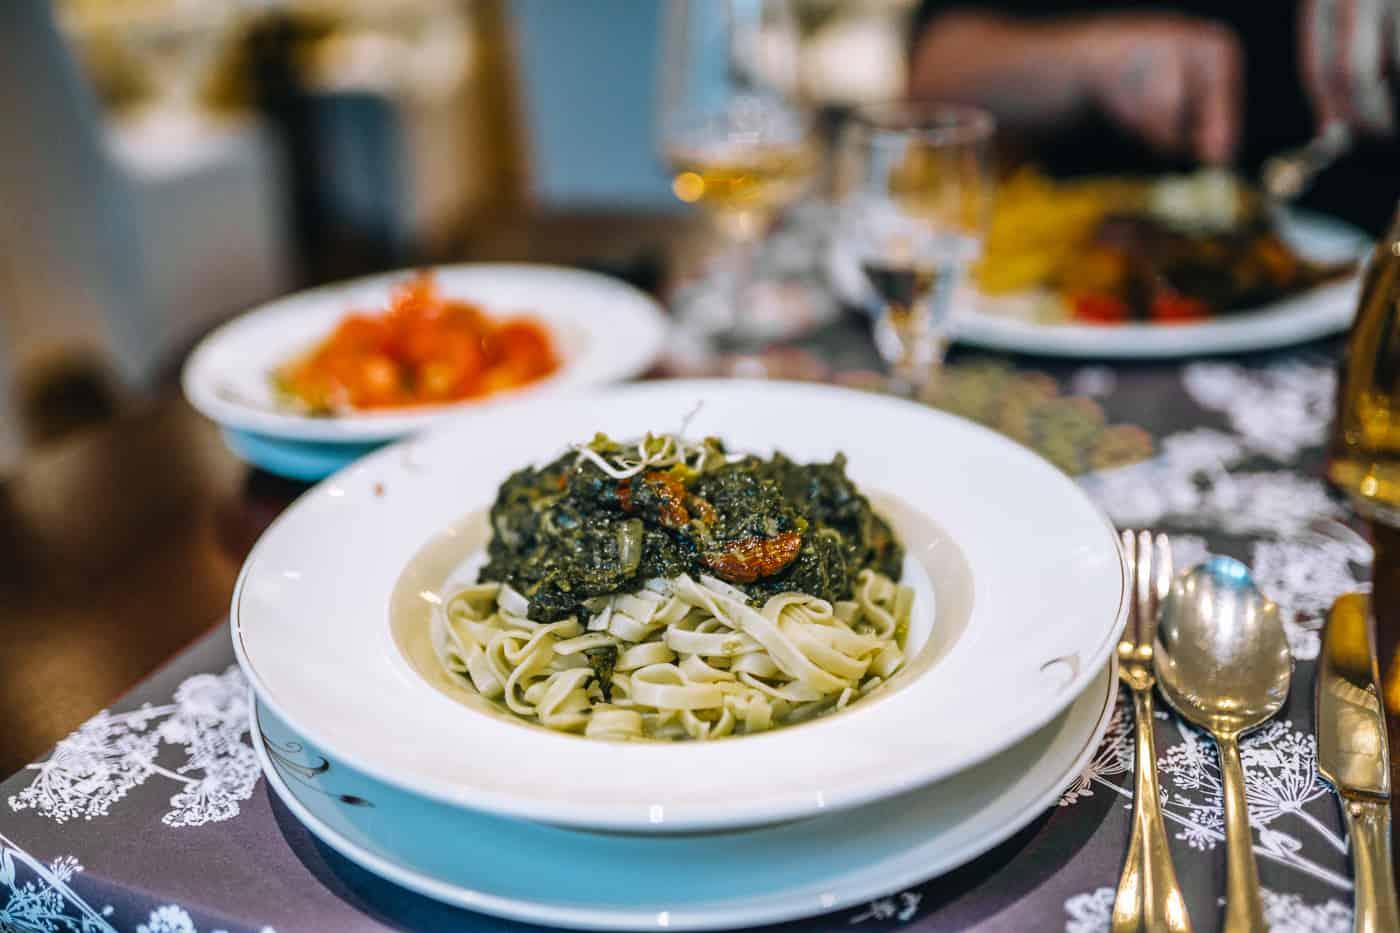 Usedom mit Hund - Restaurant 1900 / Aurelia Hotel St. Hubertus in Heringsdorf: vegetarische Pasta